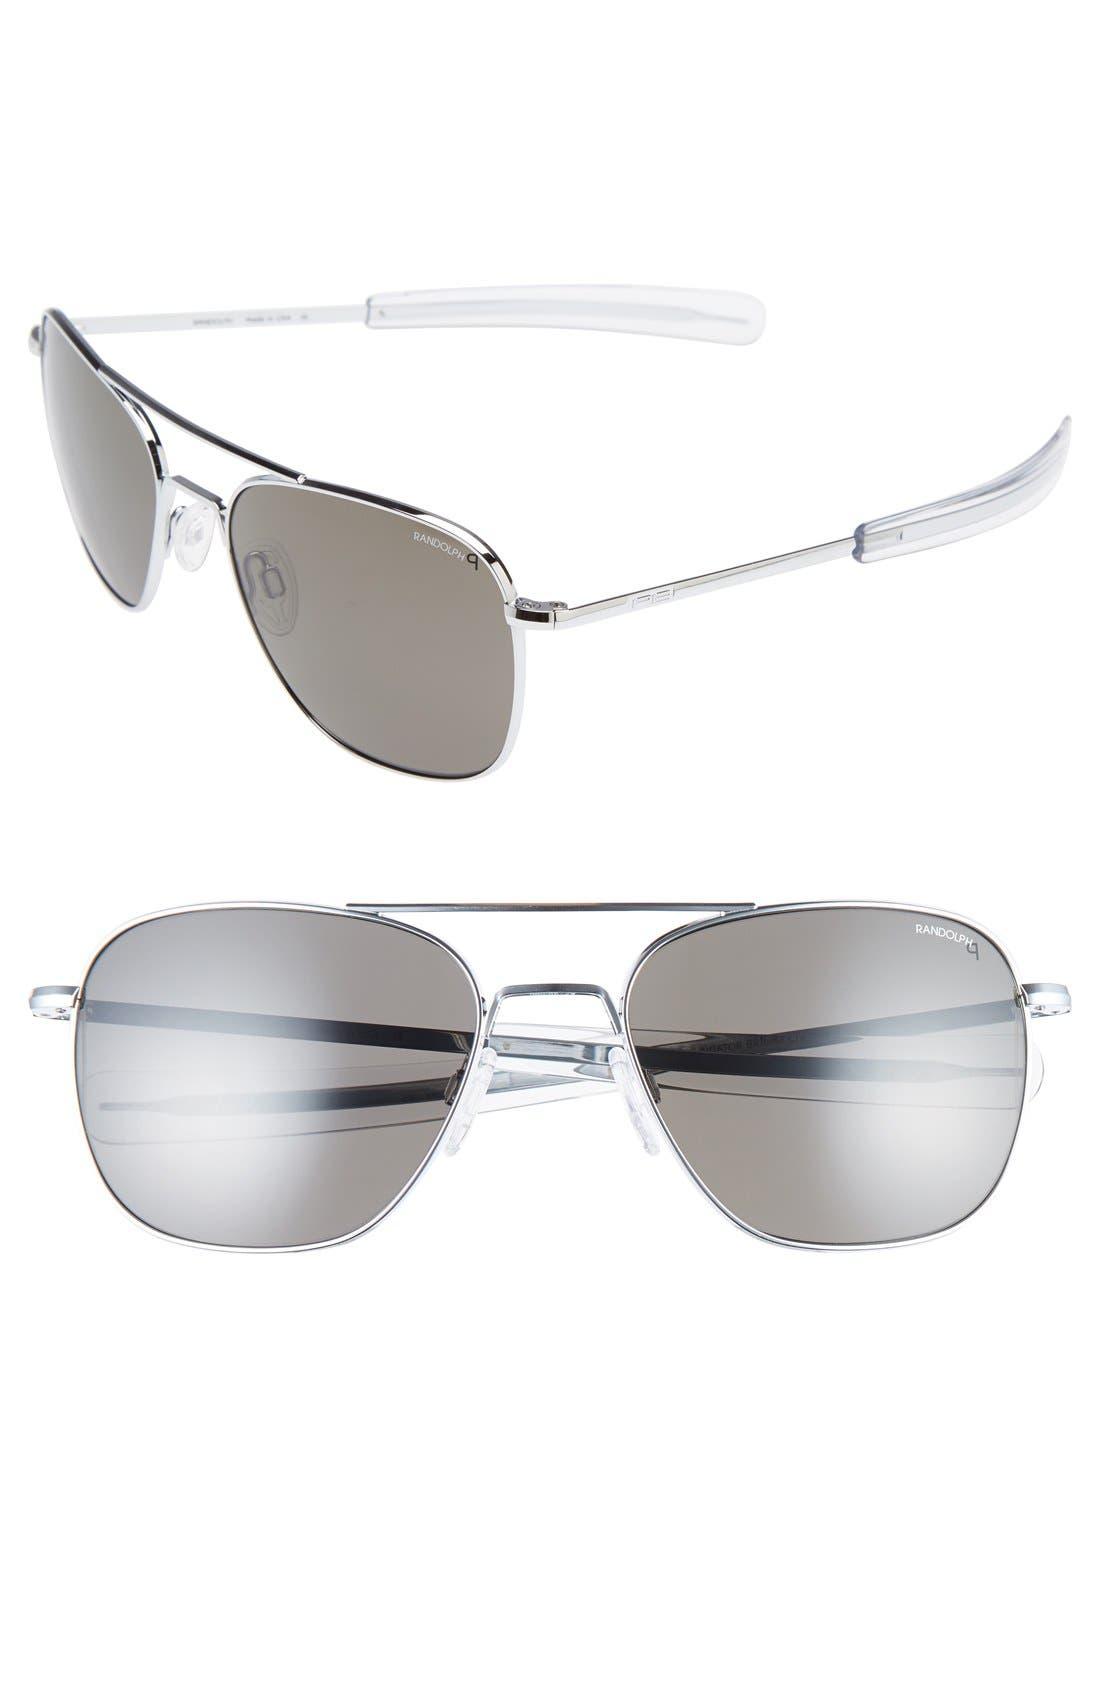 58mm Polarized Aviator Sunglasses,                             Main thumbnail 1, color,                             041